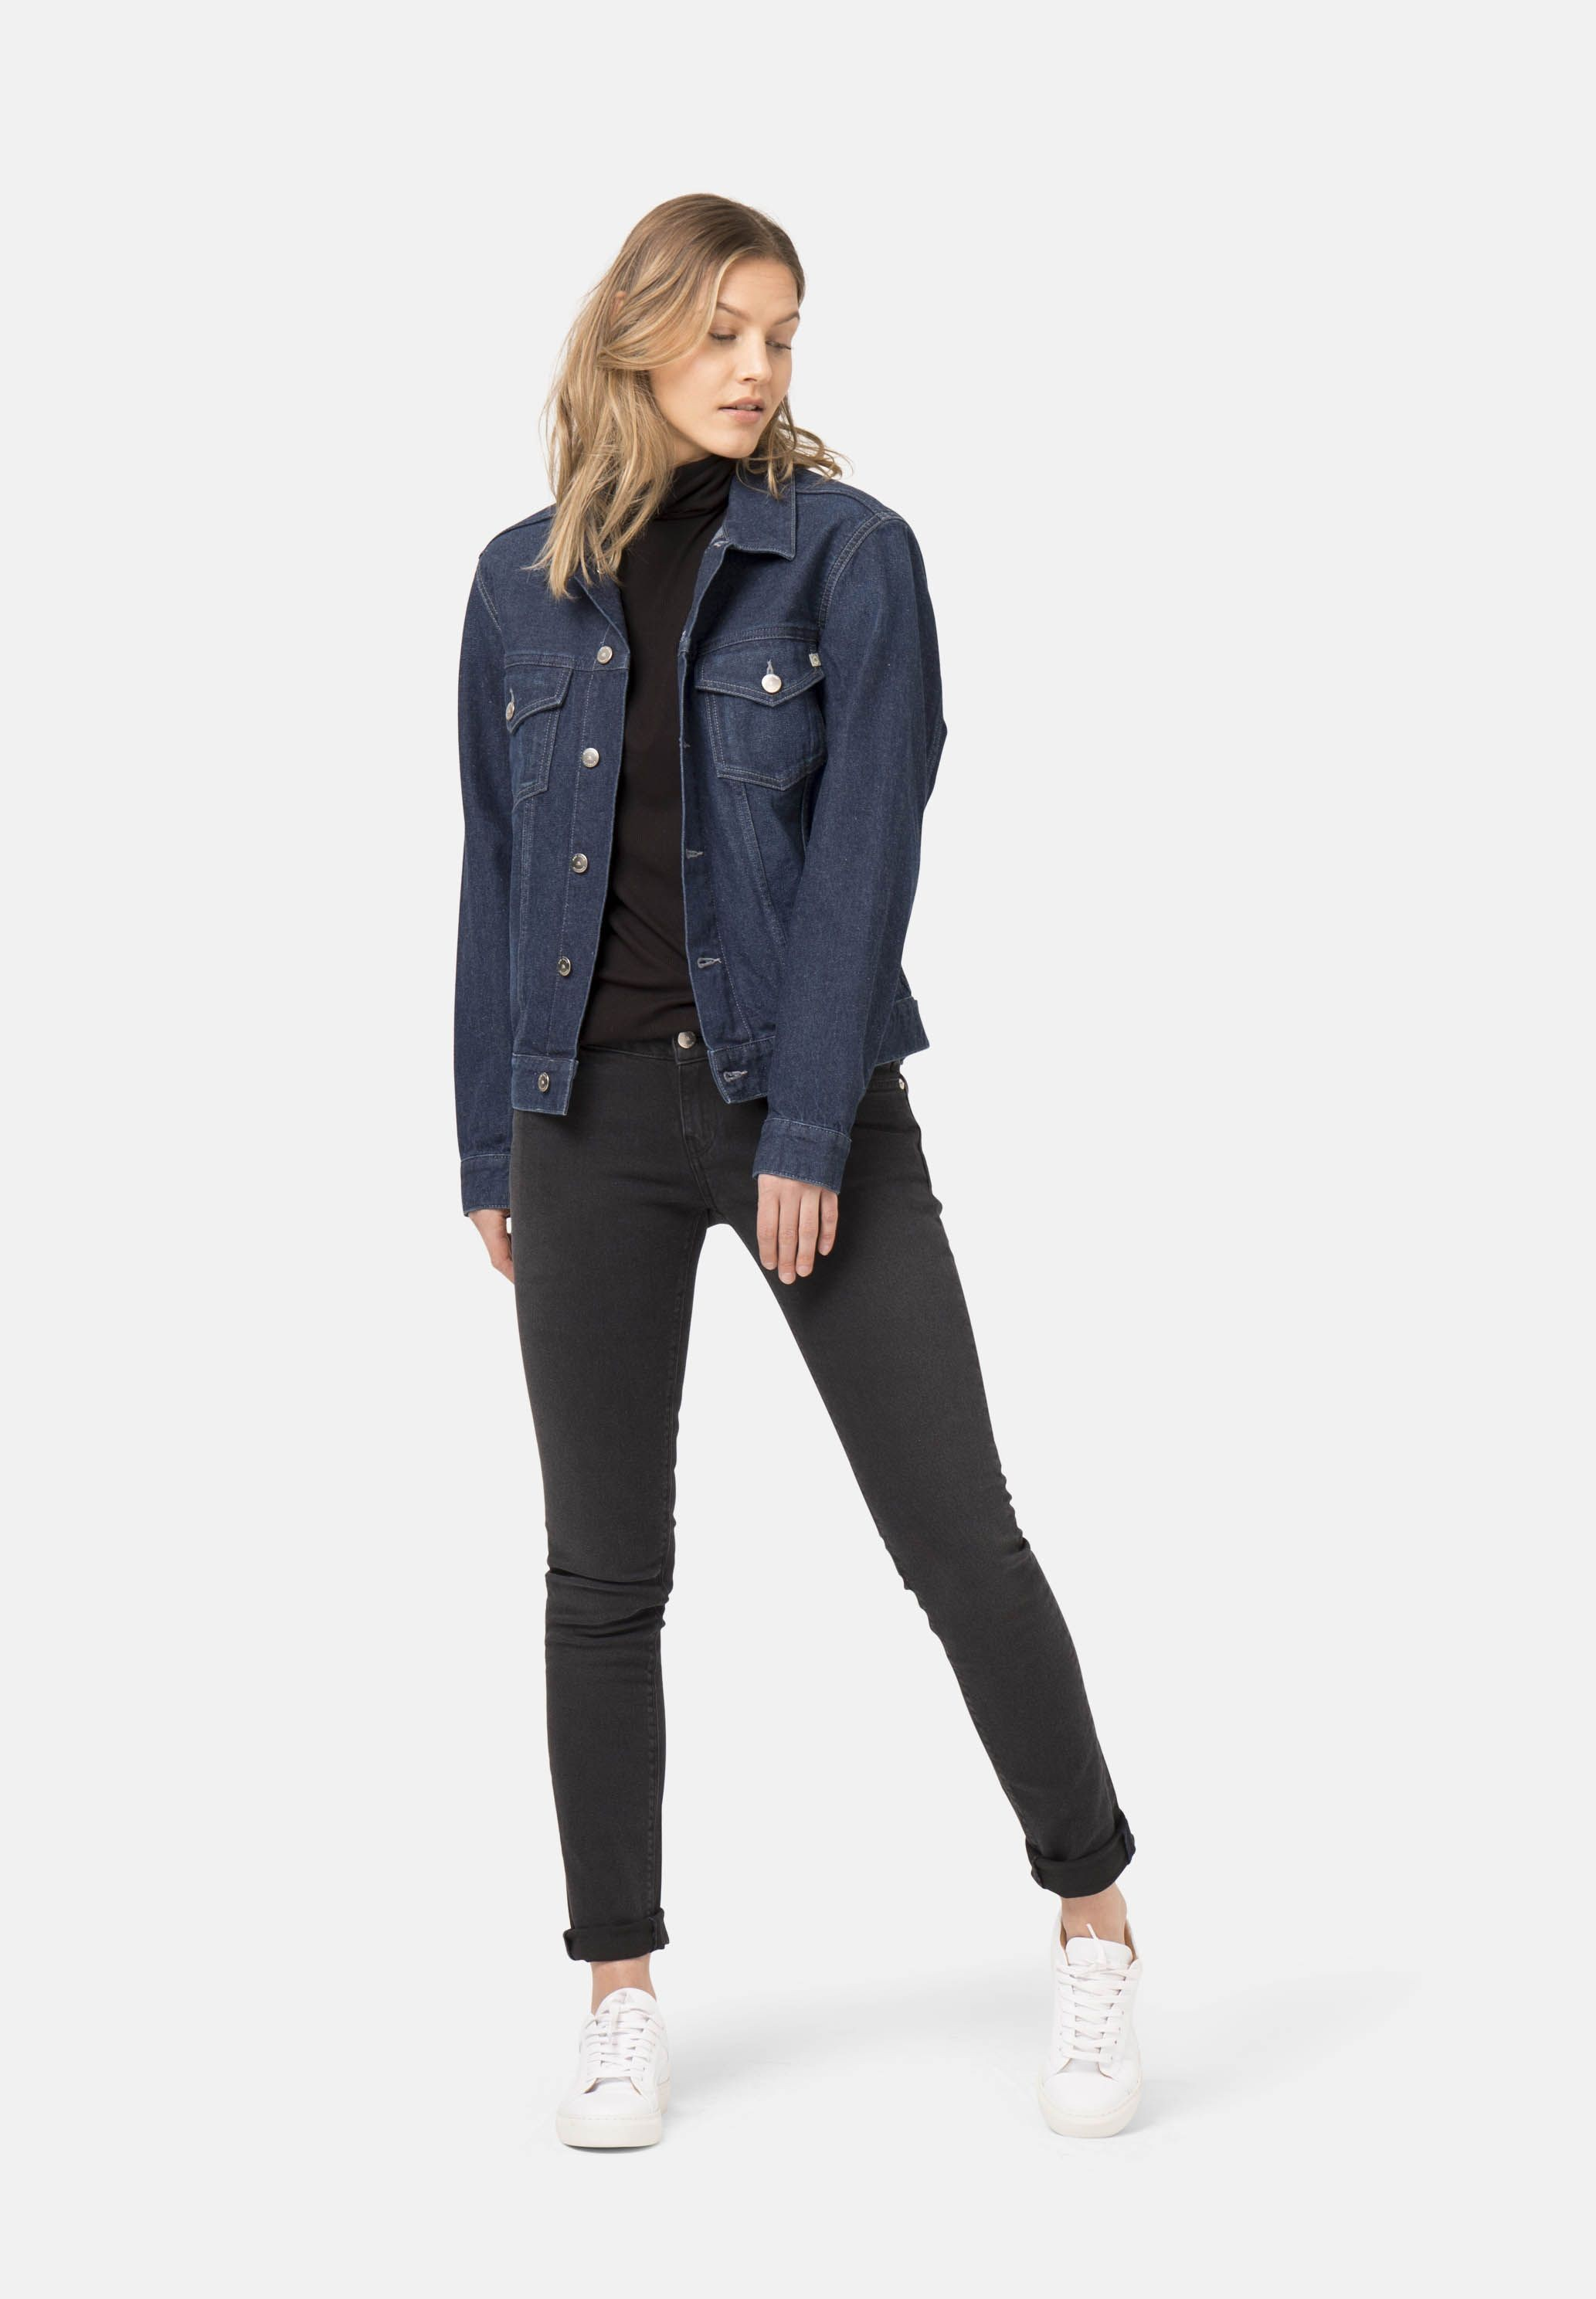 Damenjeans Mud Jeans Skinny Lilly stone black kaufen